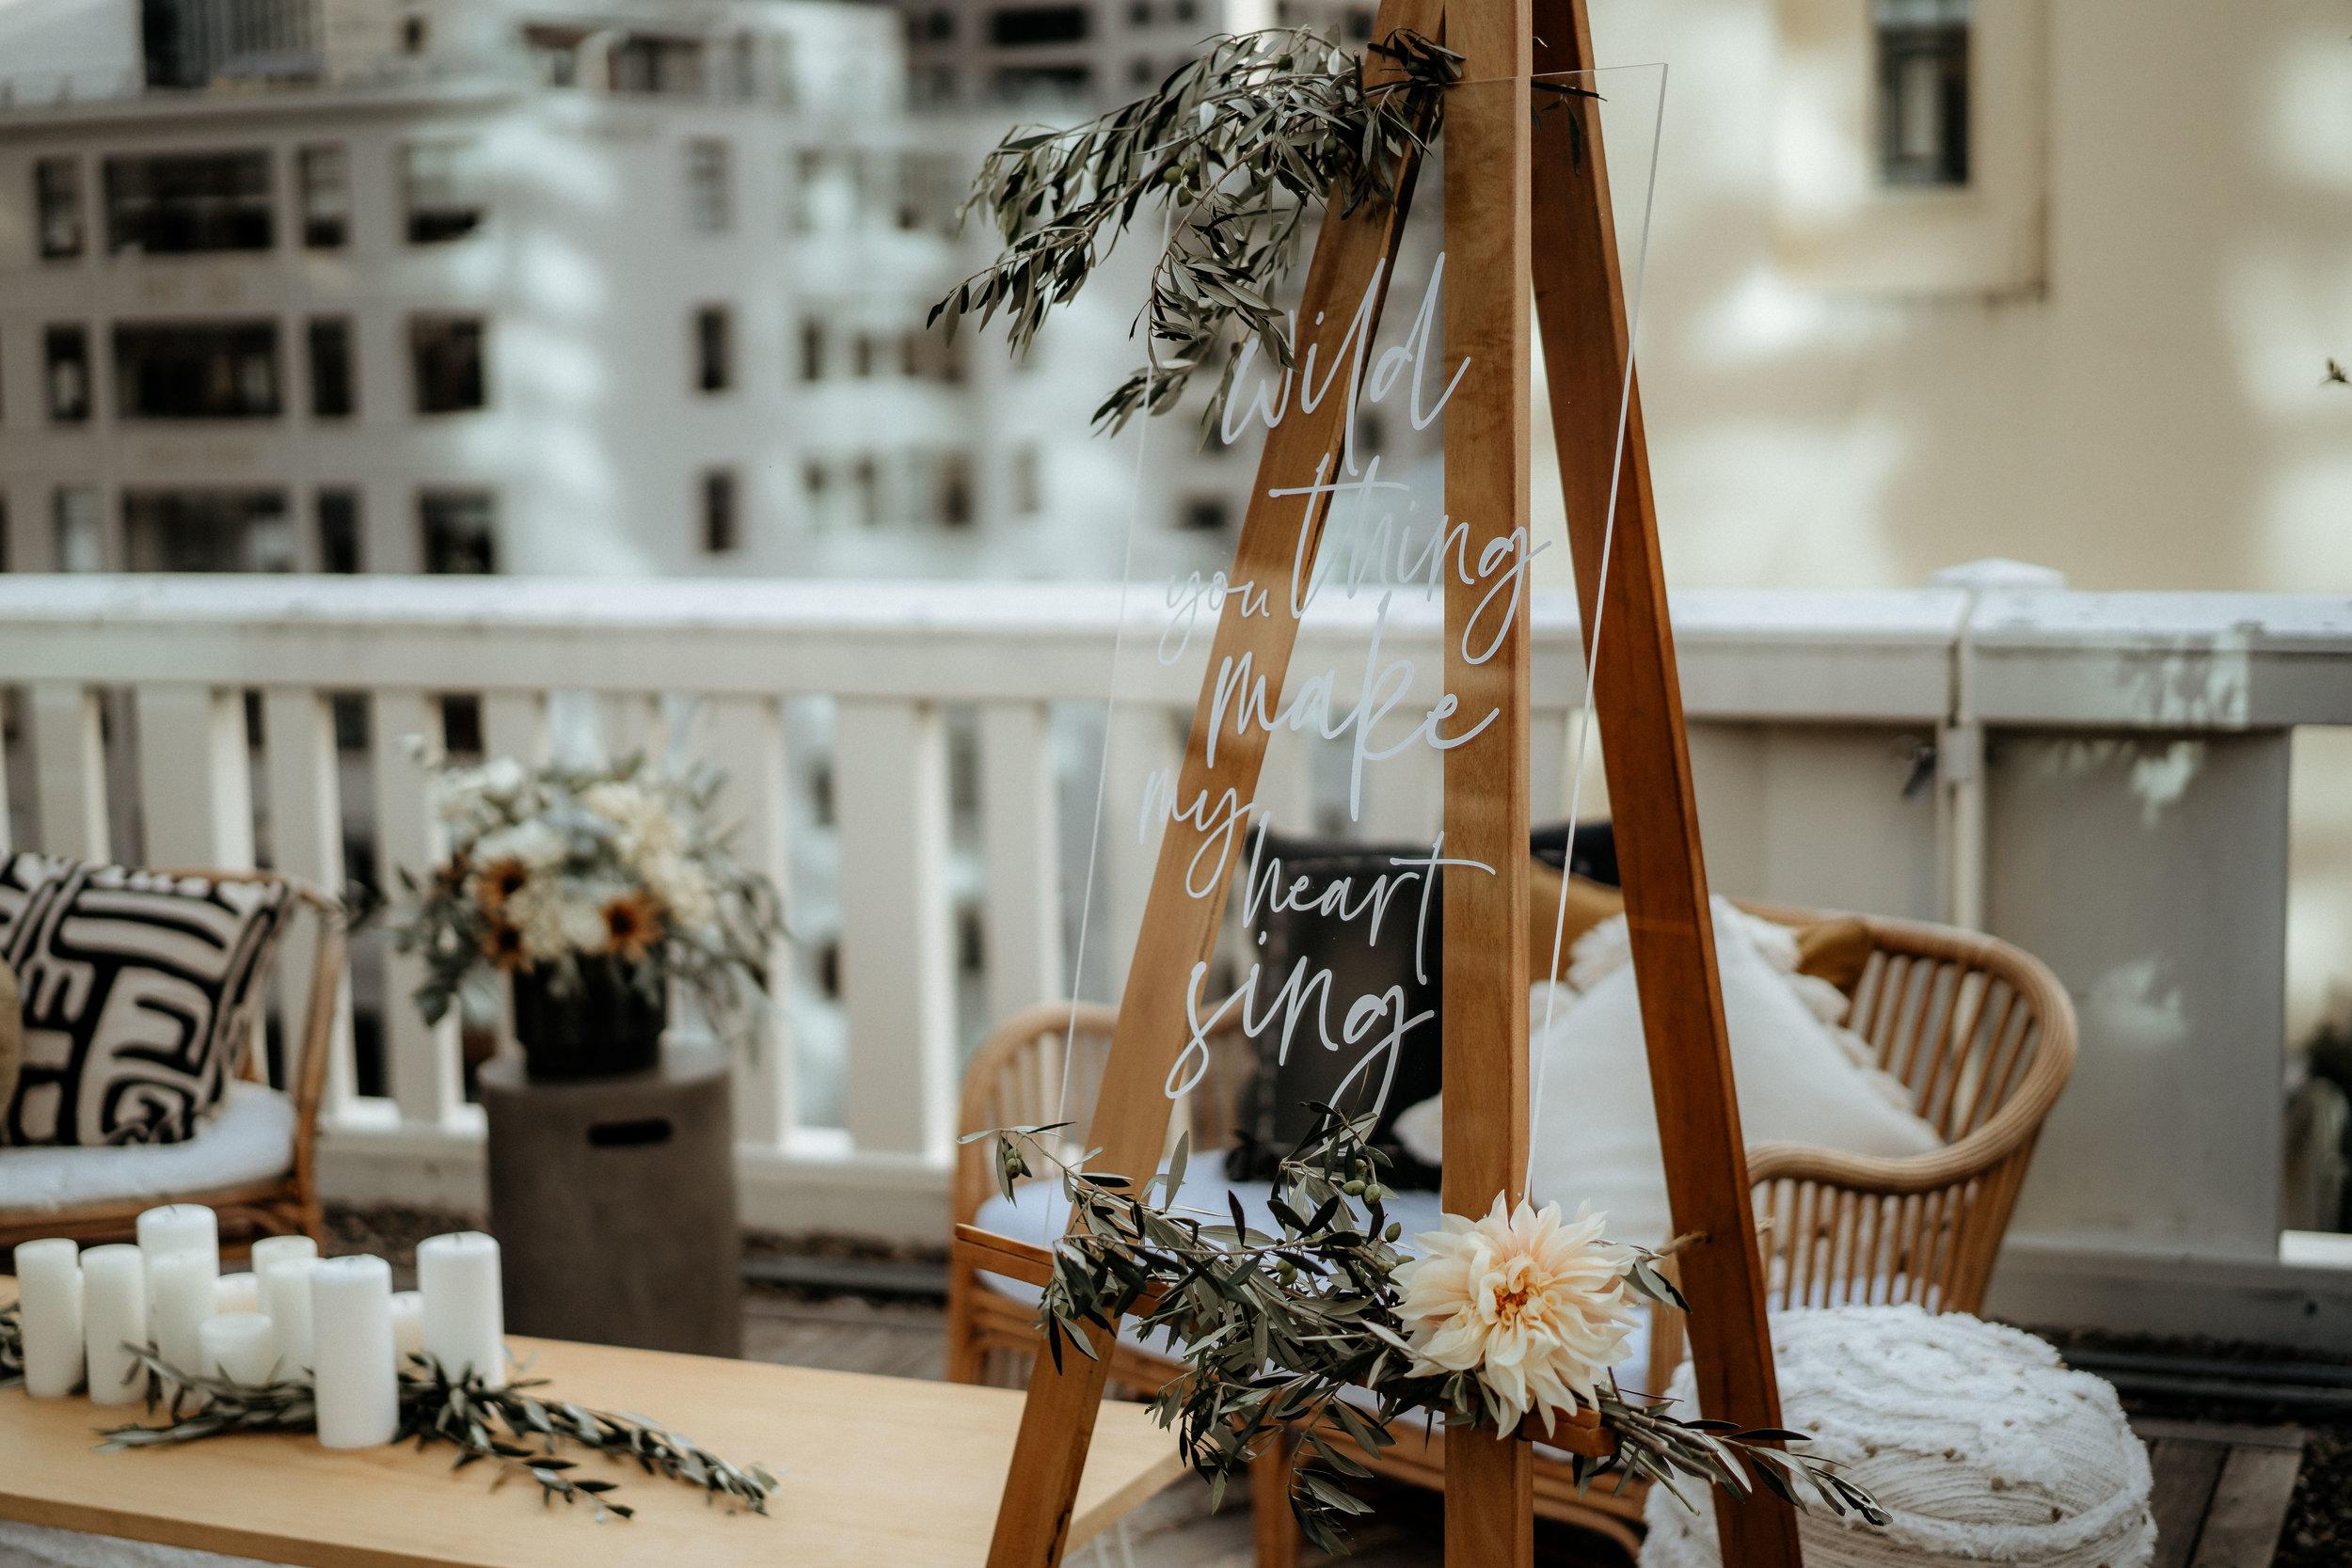 zandaphotography_Boheme_events_wedding_Auckland-82 (1).jpg